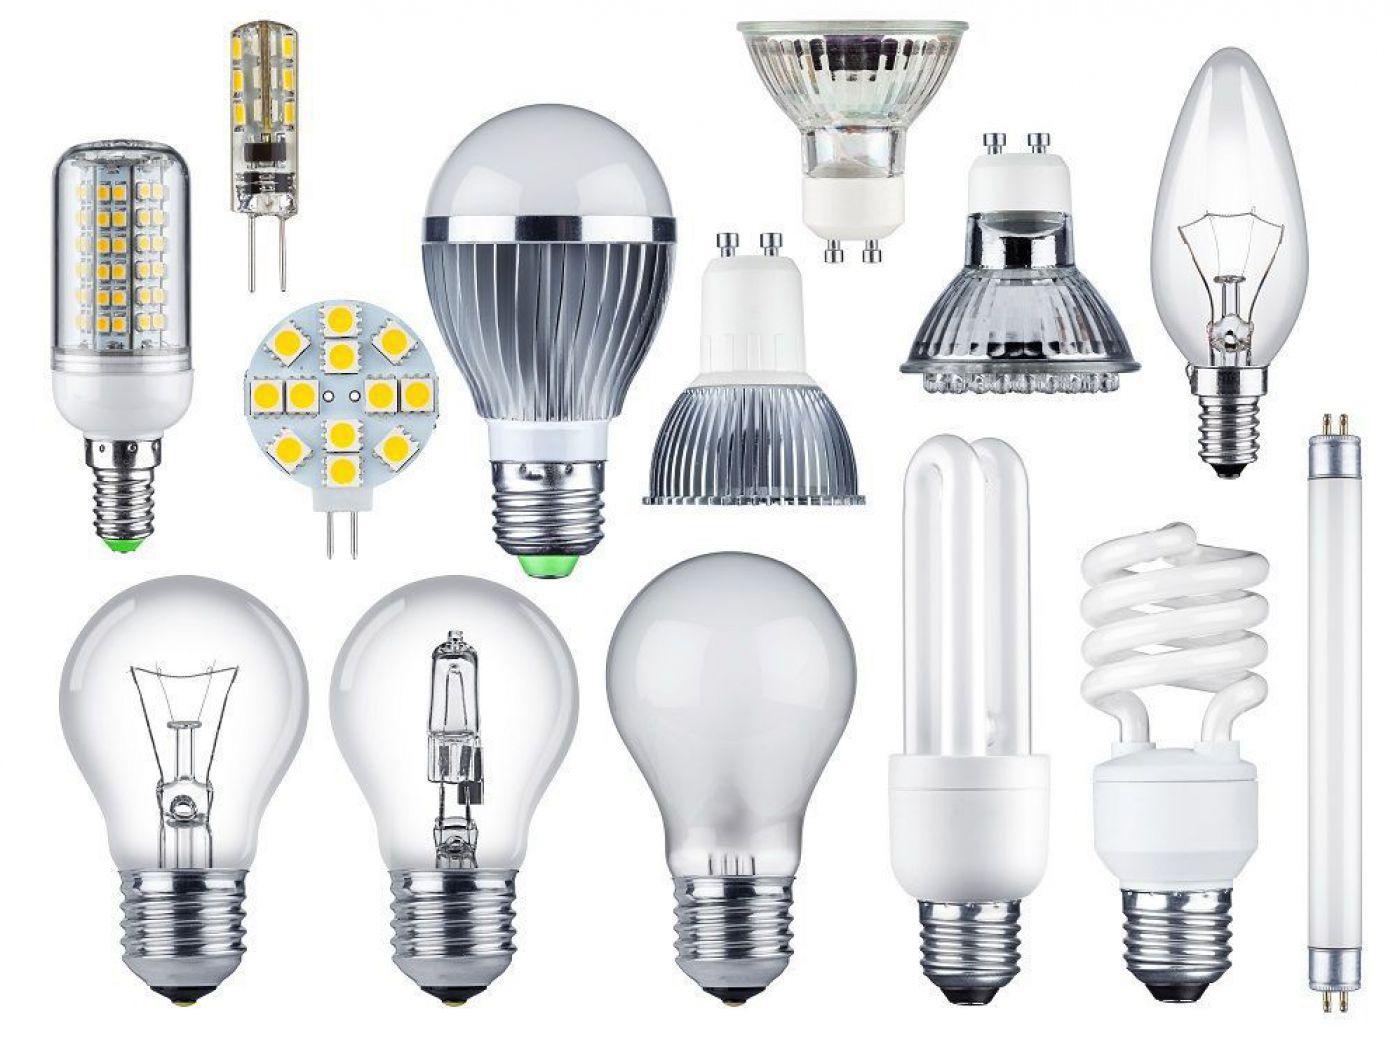 halogenlampe entsorgen